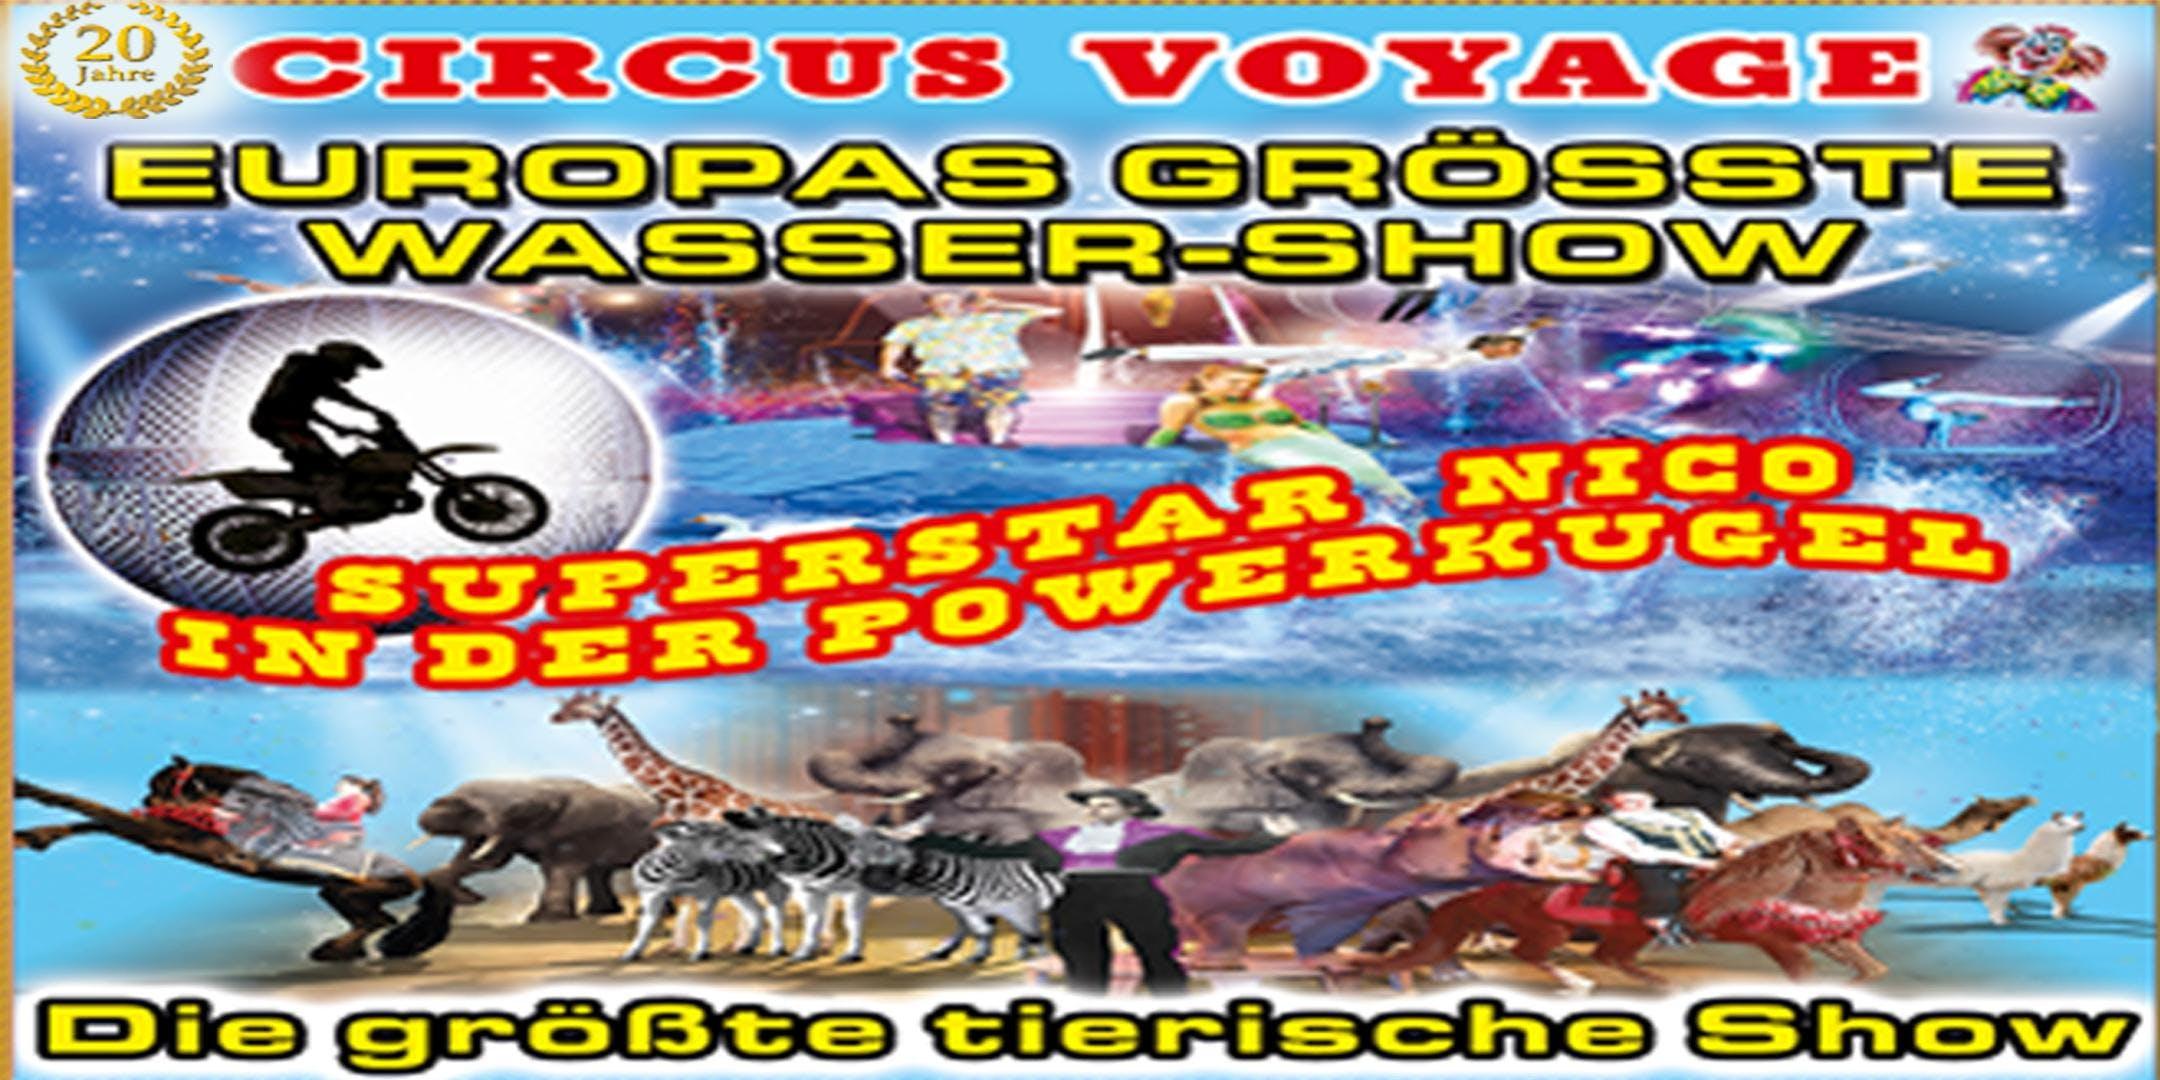 Circus Voyage in Regensburg 2018